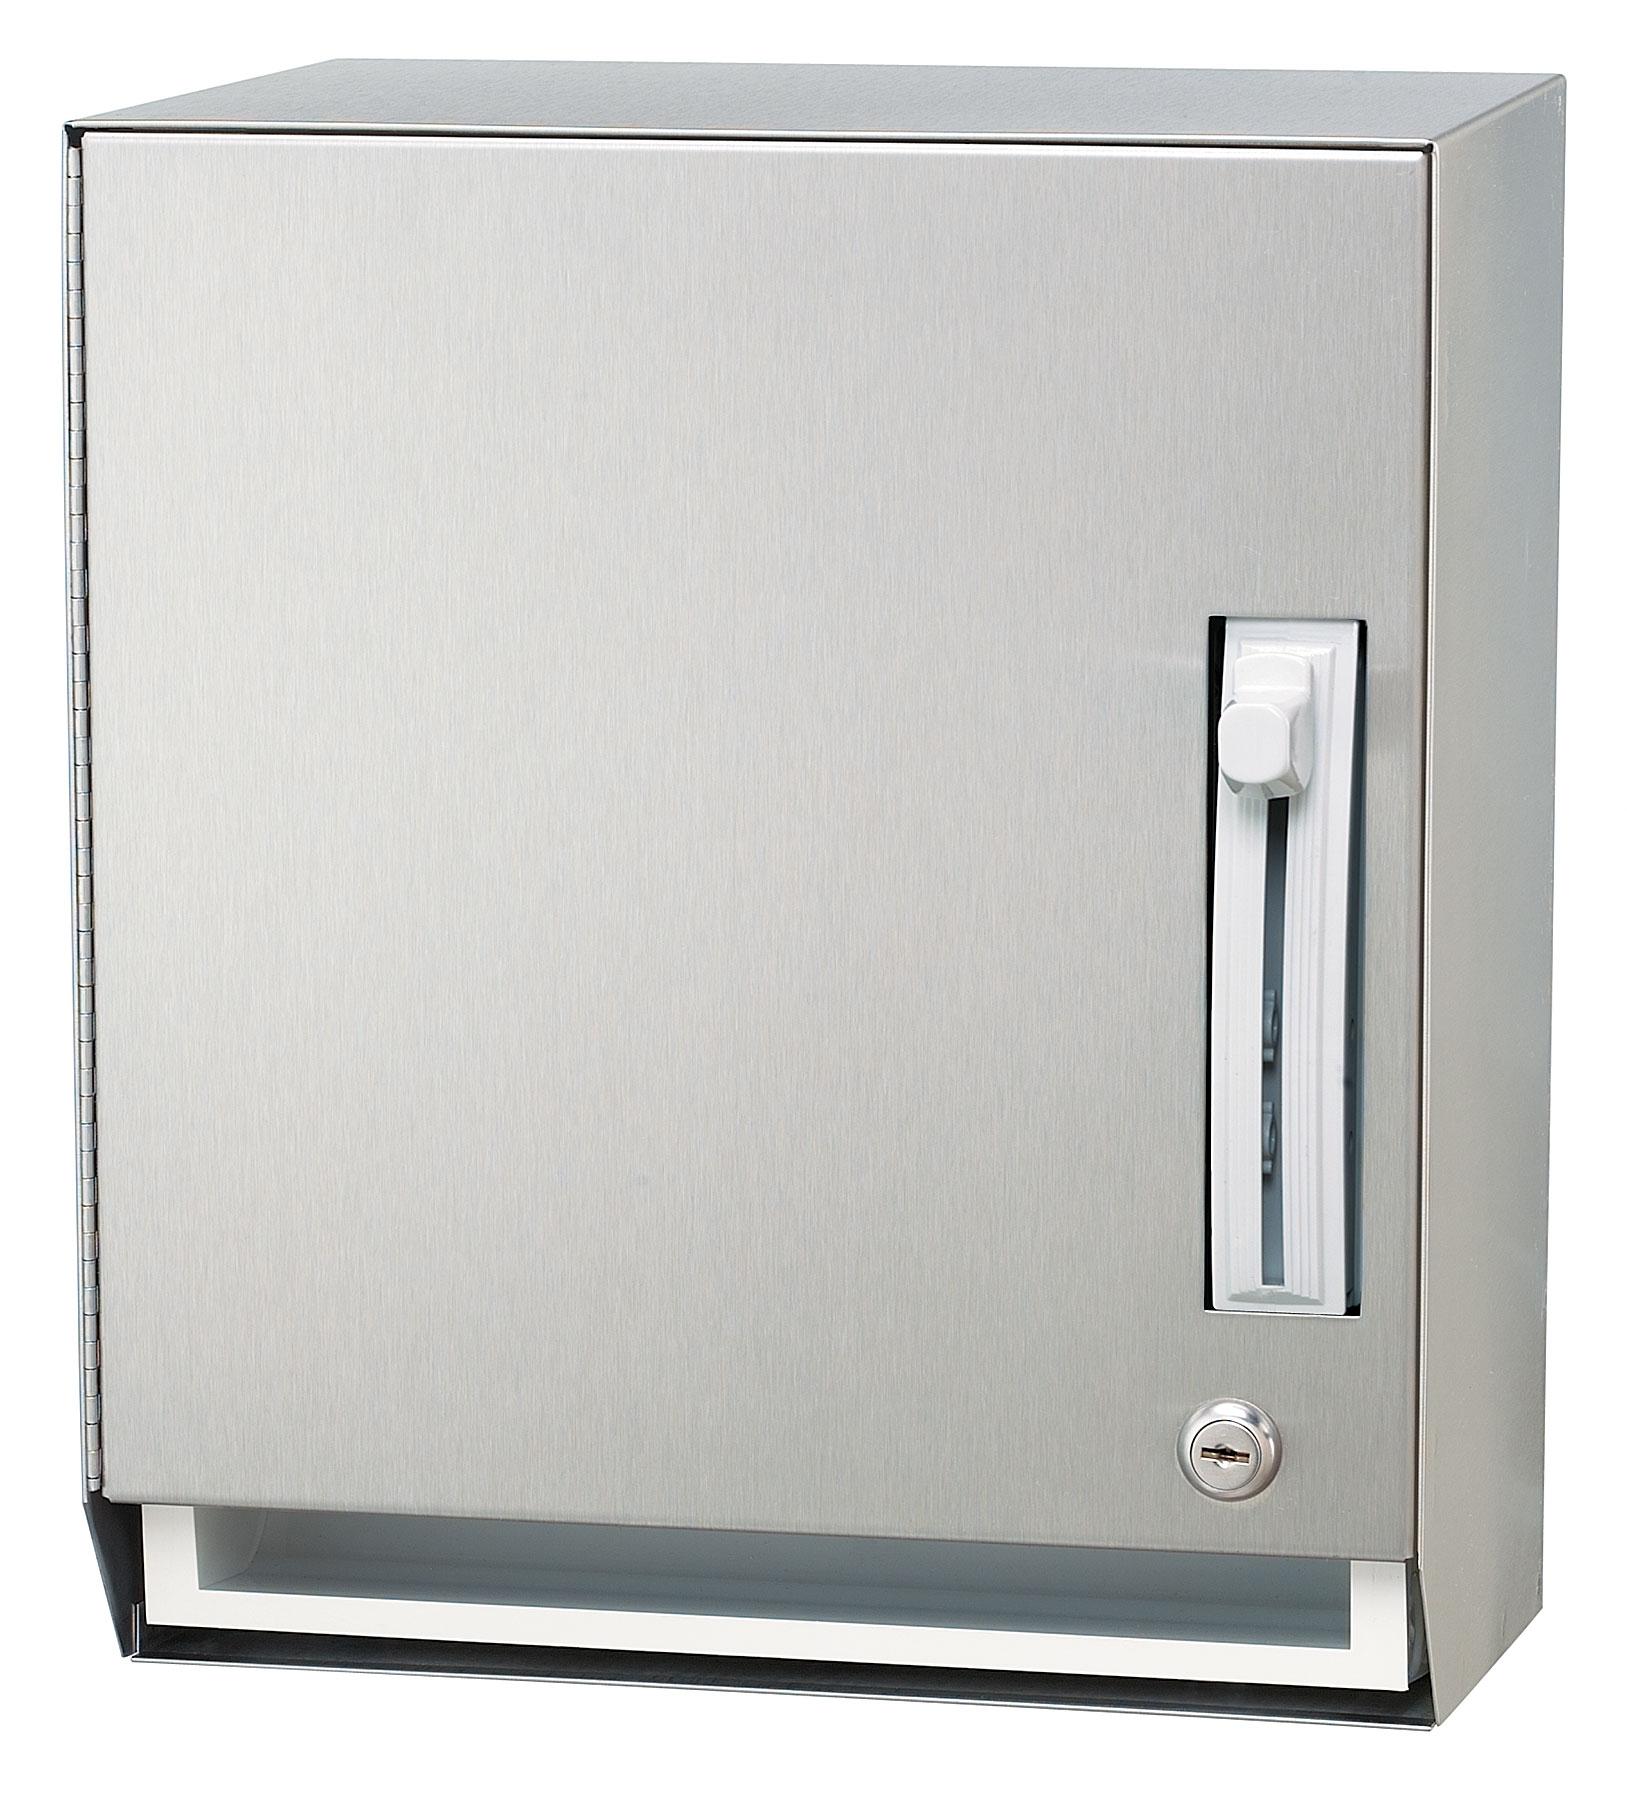 Lever Roll Towel Dispenser Bradley Corporation